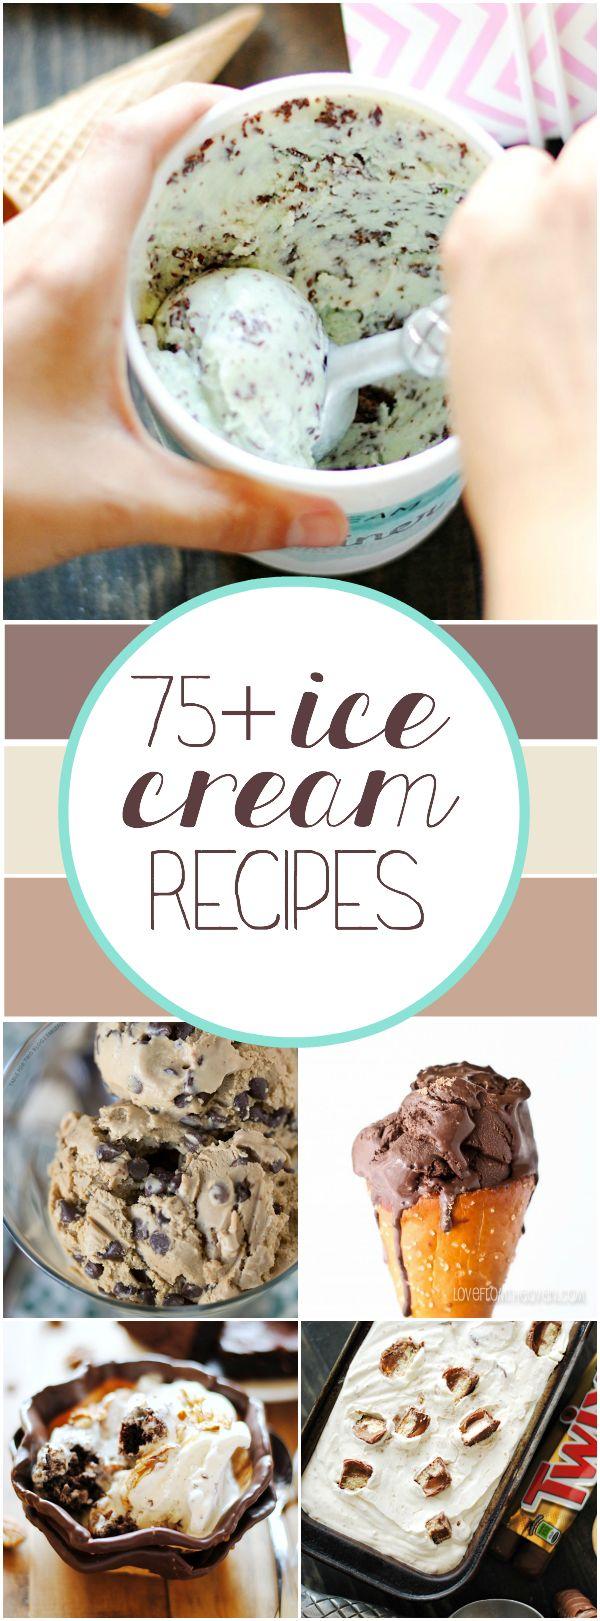 206 best ICE CREAM images on Pinterest   Frozen desserts, Homemade ...